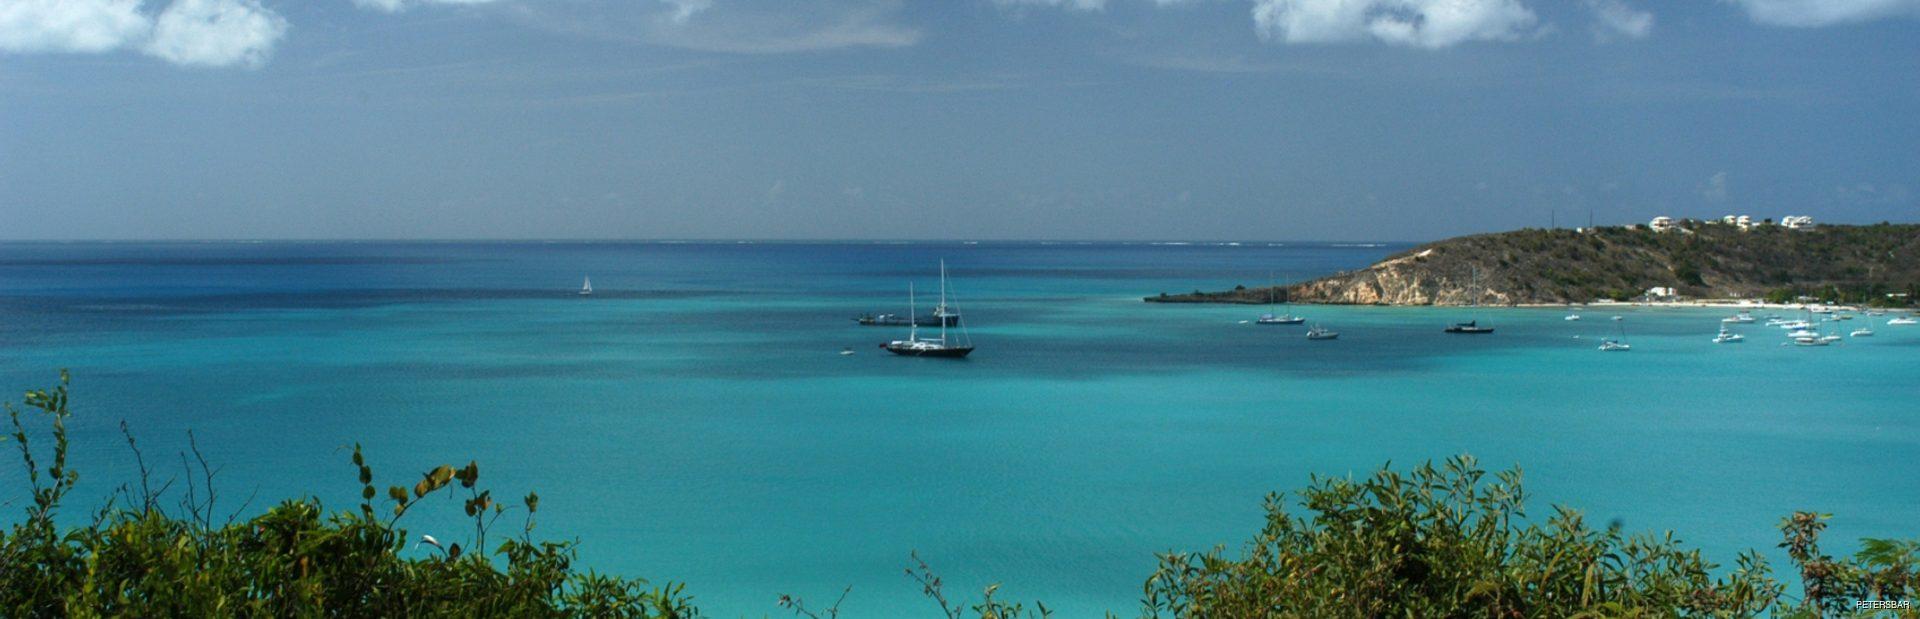 Drifting sailboat on beautiful bay